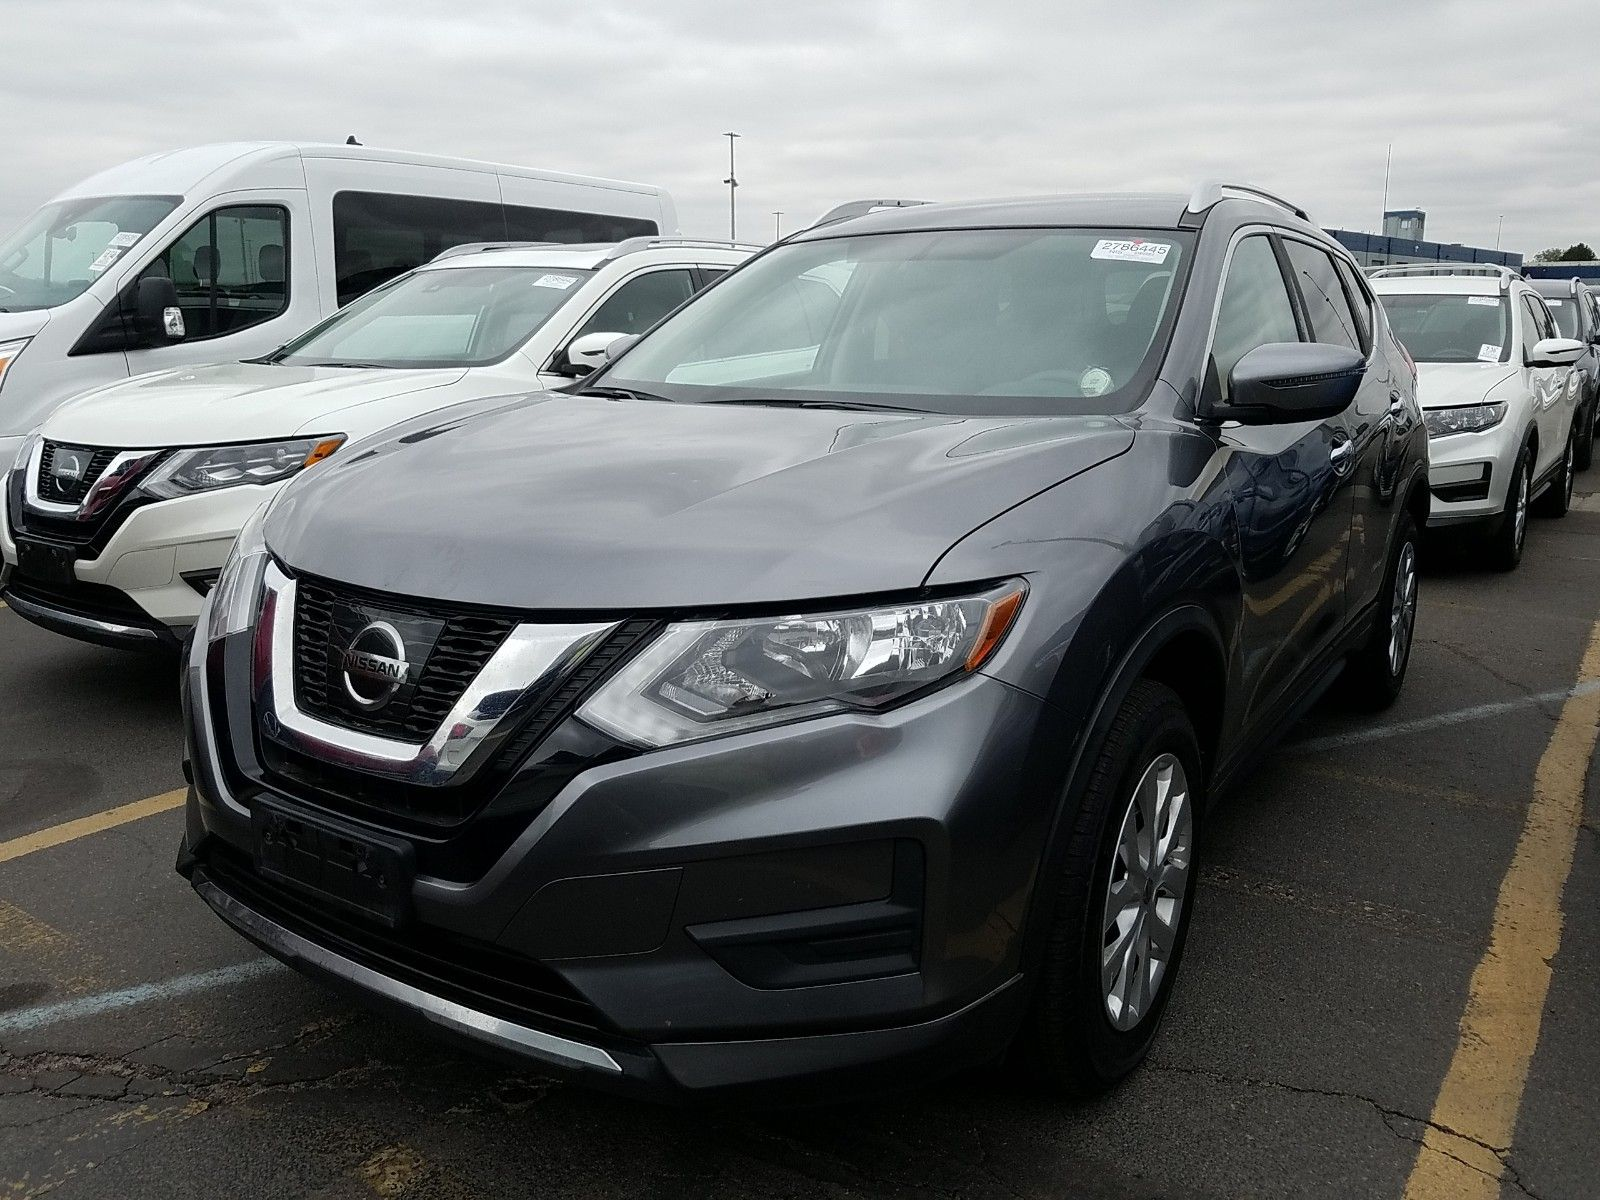 2017 Nissan Rogue 2.5. Lot 99913281893 Vin KNMAT2MV1HP580925